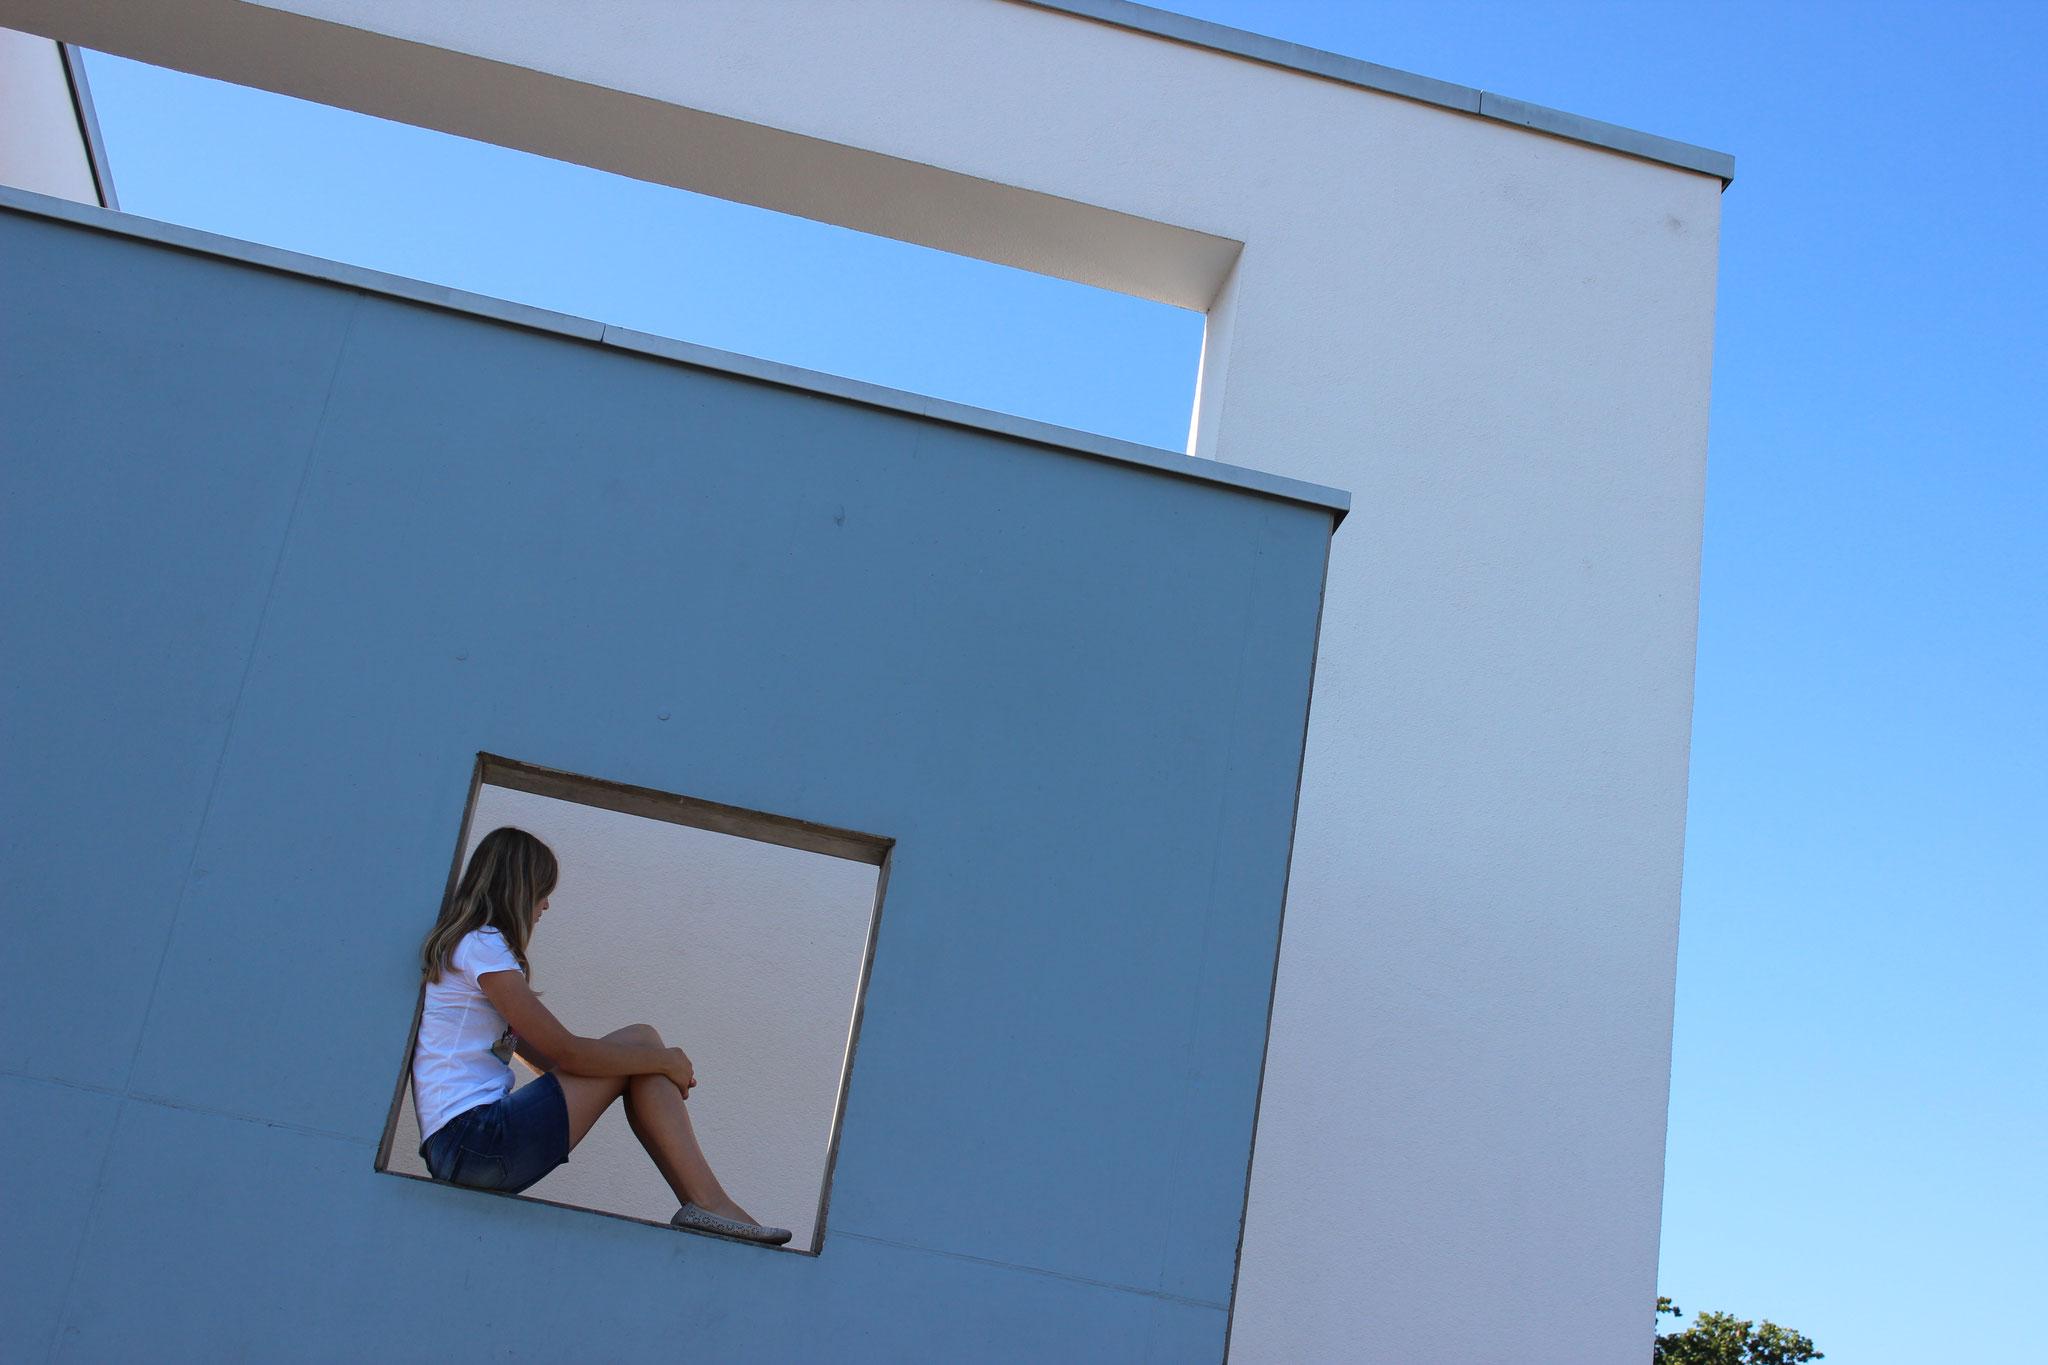 Platz 8 - Miina Siemers